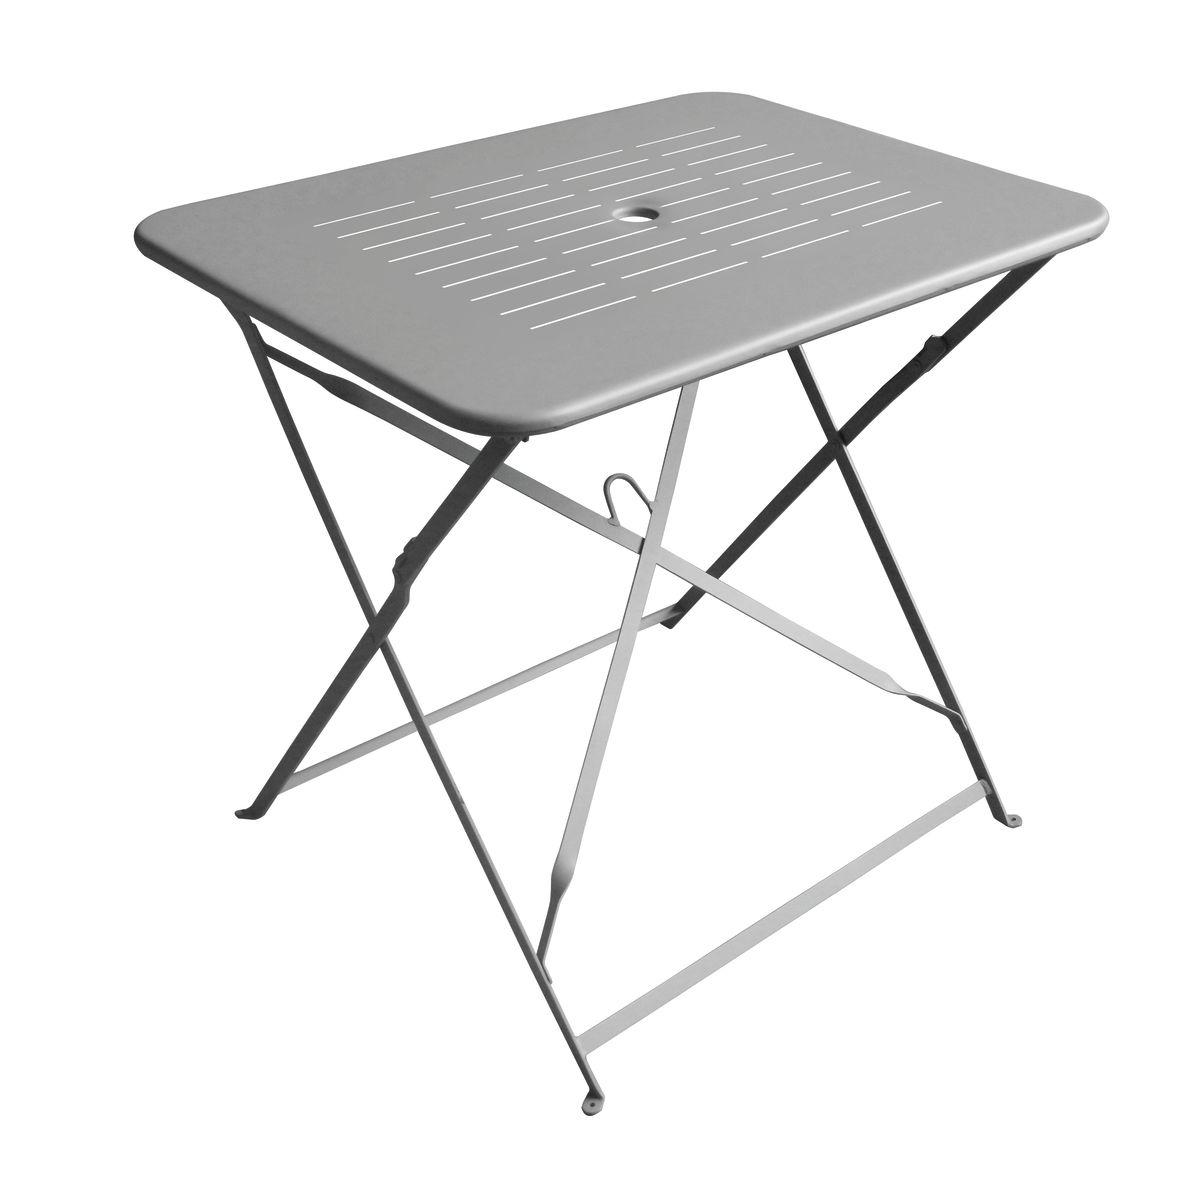 Gazebo roma arredi giardino ferro battuto tavoli for Tavoli e sedie in ferro battuto da giardino prezzi